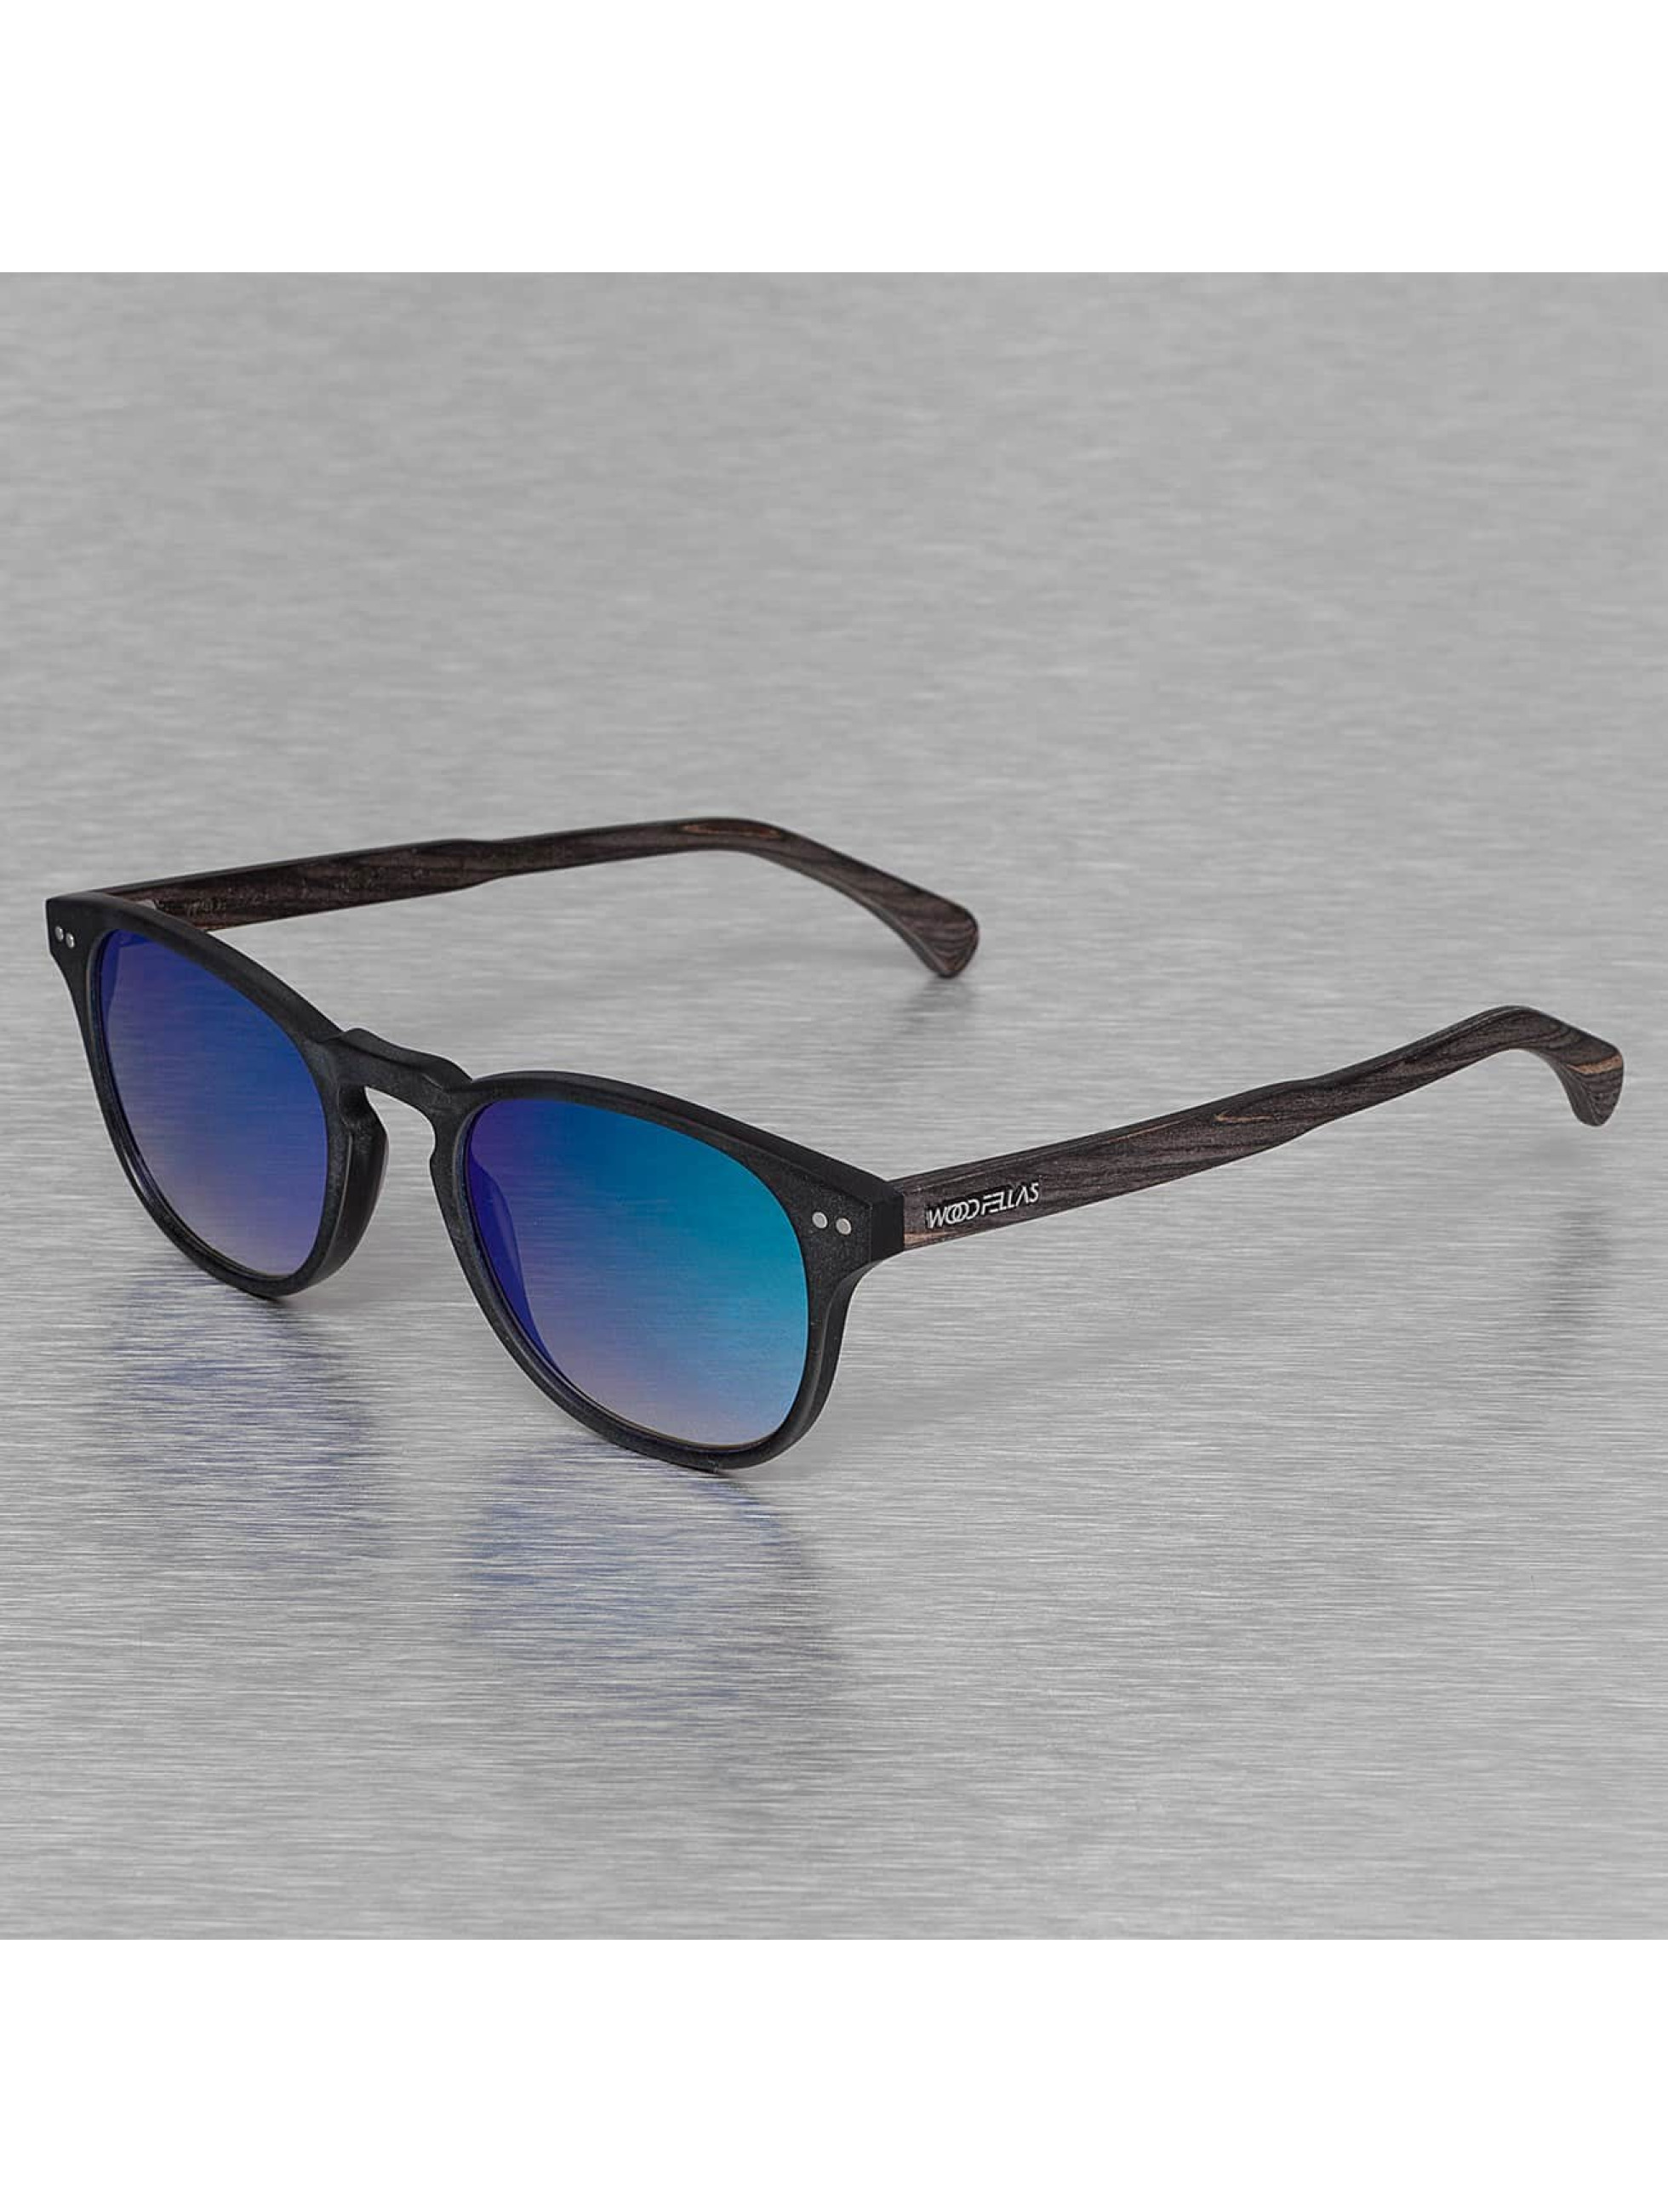 Wood Fellas Eyewear Sonnenbrille Eyewear Haidhausen Polarized Mirror schwarz